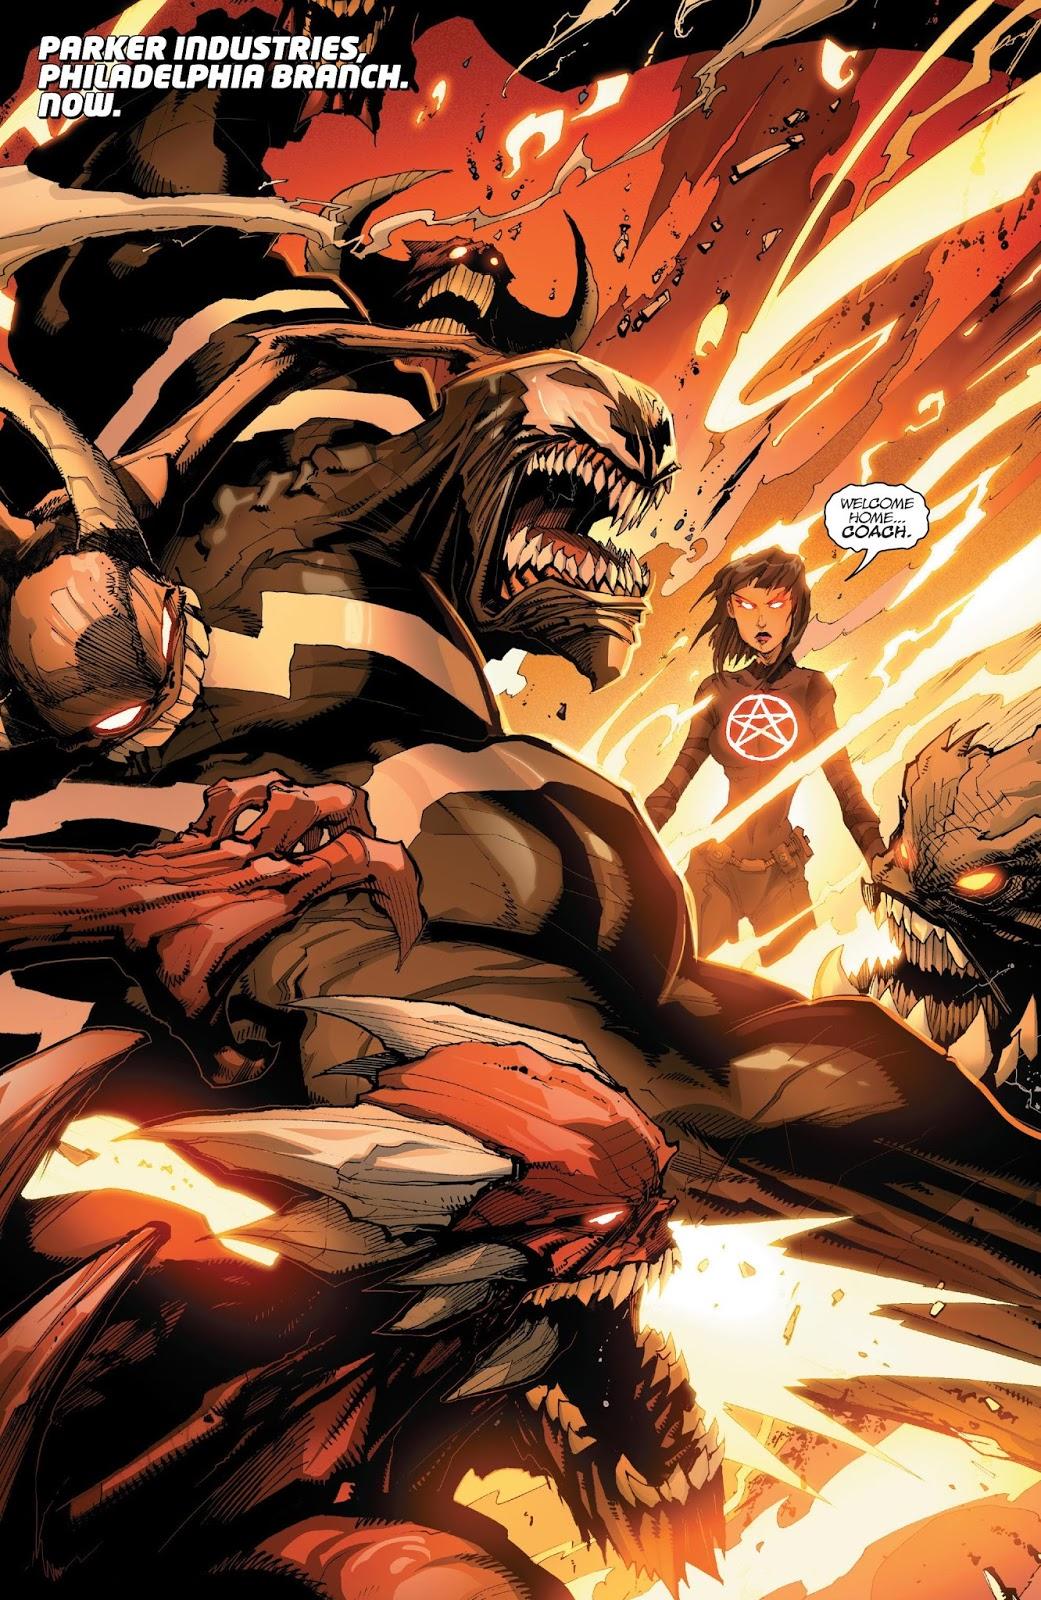 Weird Science Dc Comics Venom Space Knight 13 Review